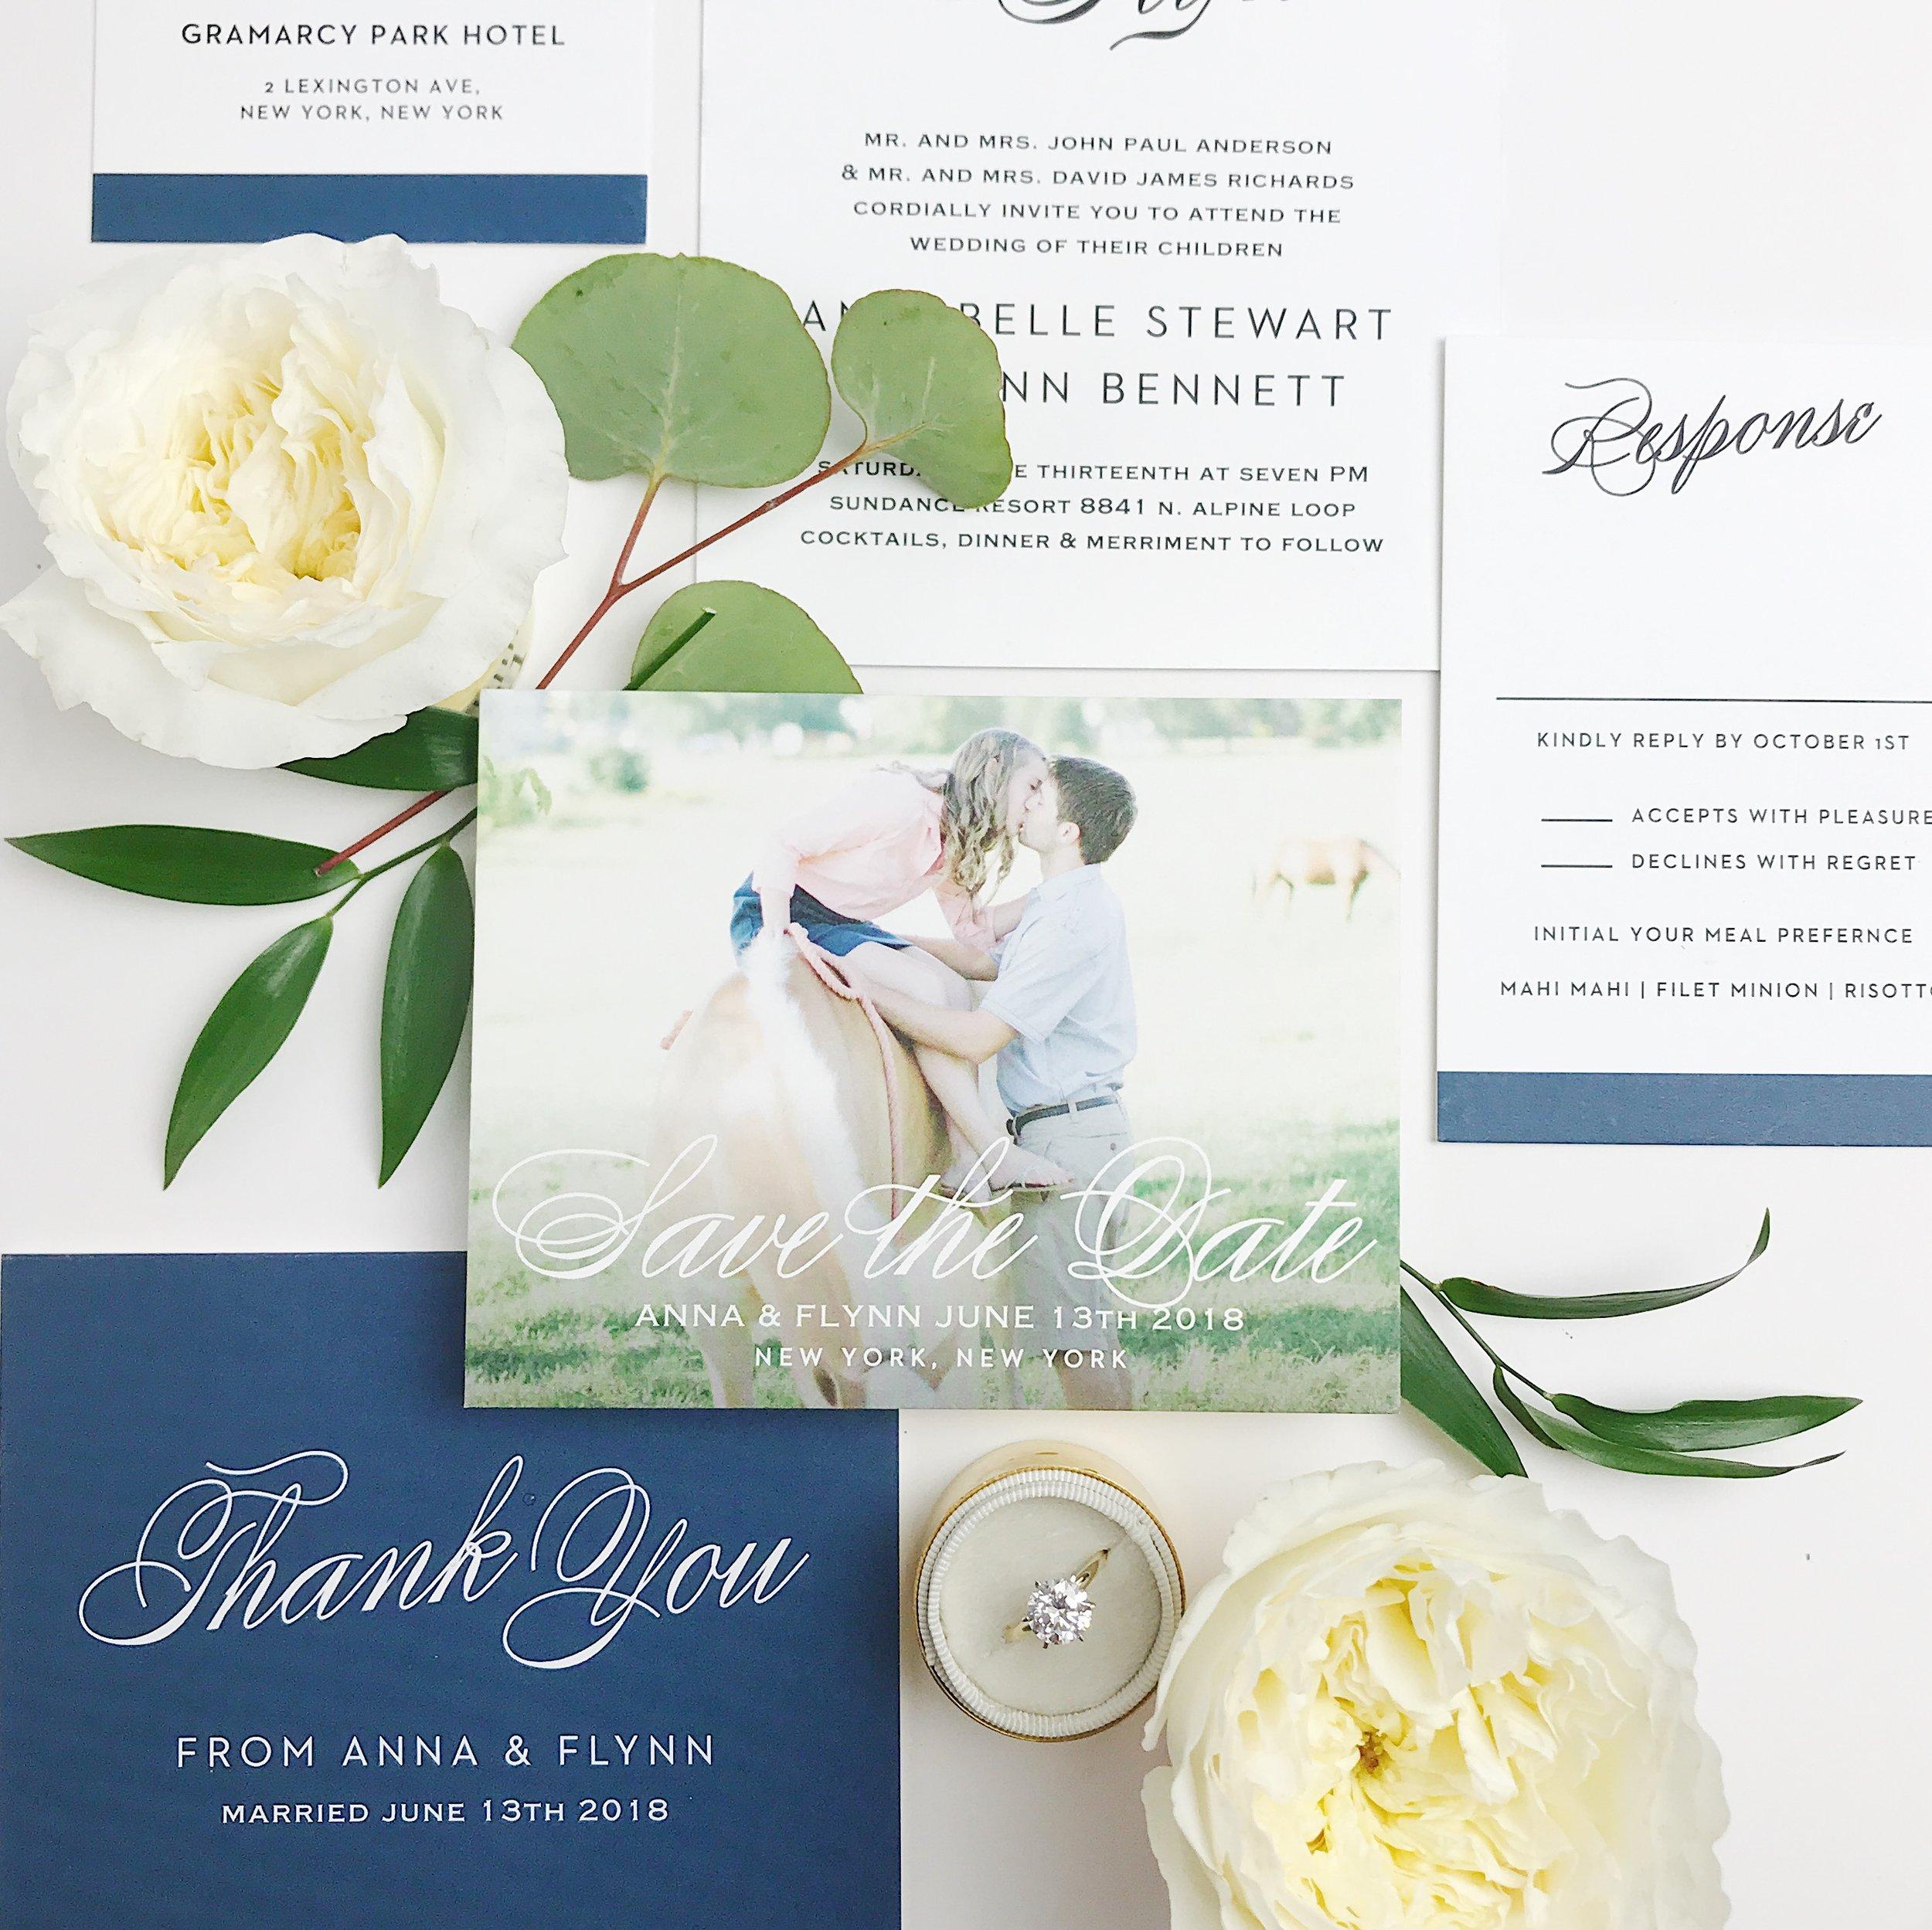 Basic_Invite_Fall_Winter_Wedding_7.jpg